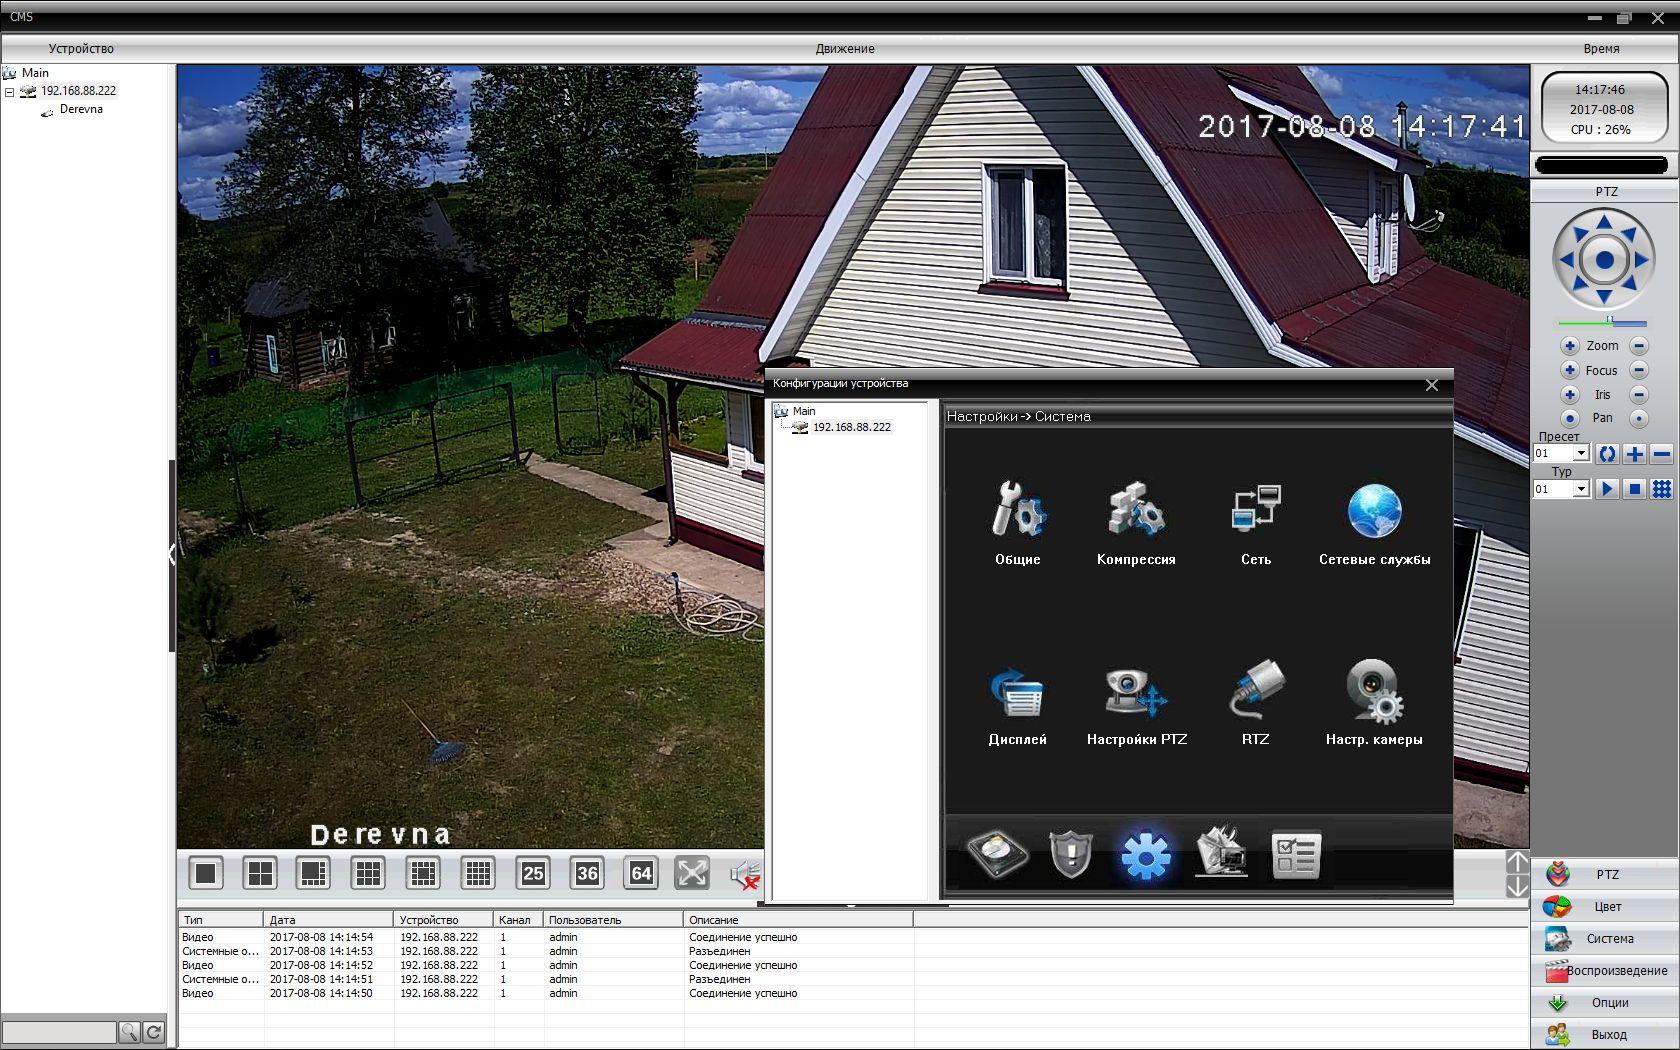 Интерфейс CMS для камеры OKAYVISION OK-HD200M64X-355